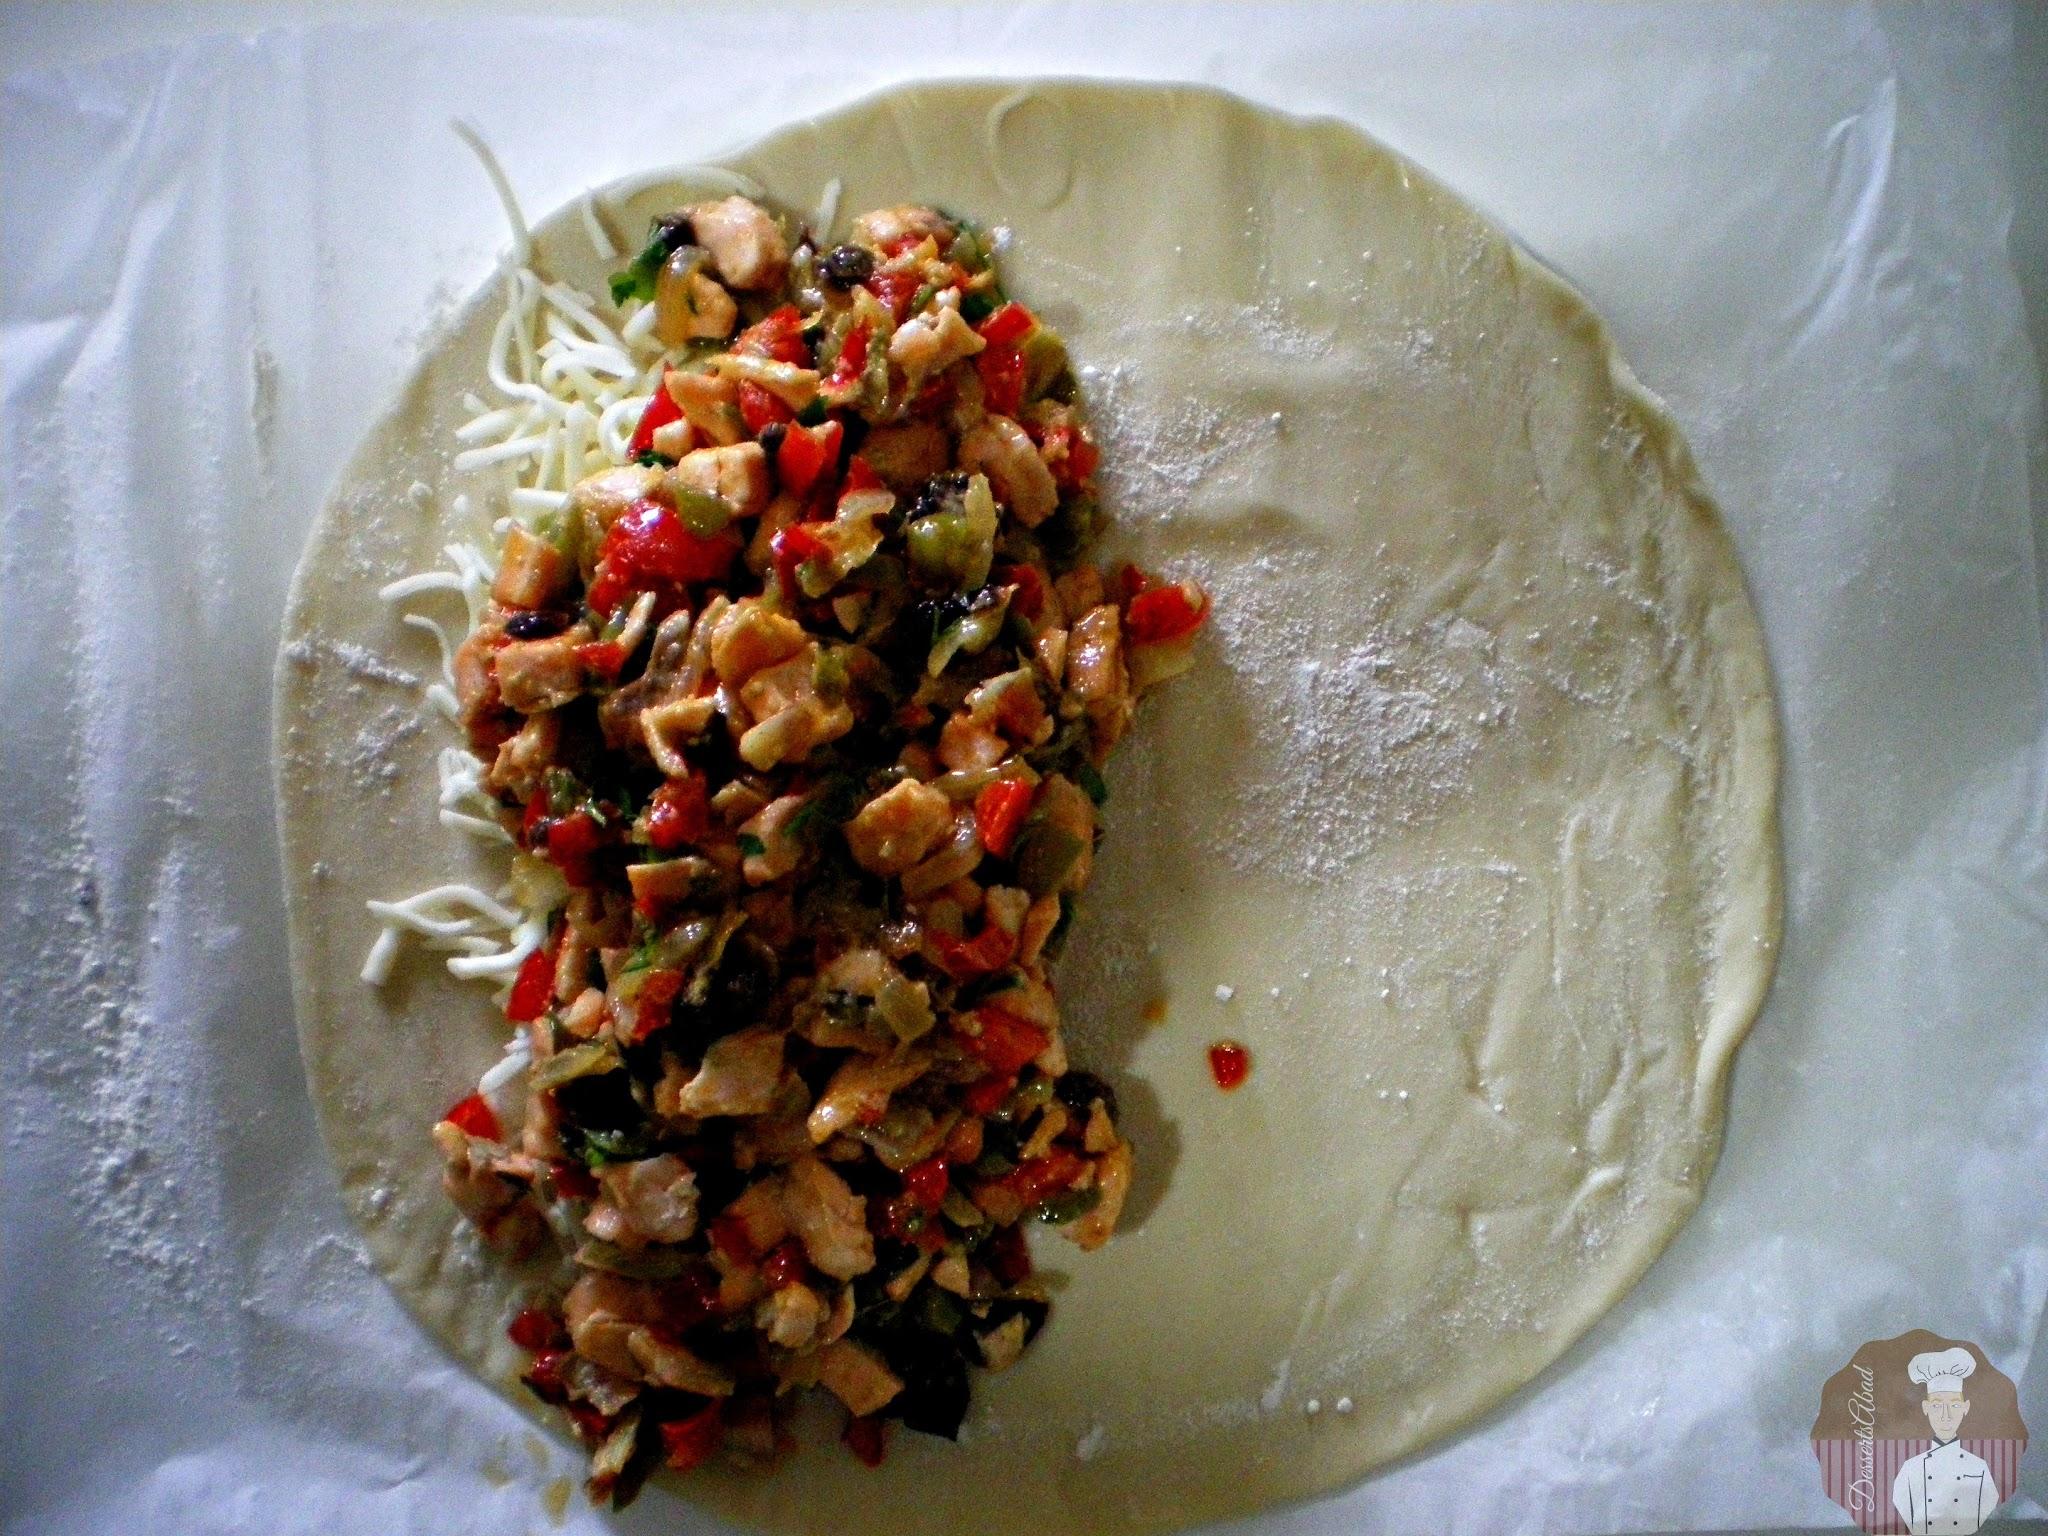 Calzone de salmon con verduras: Relleno con el sofrito